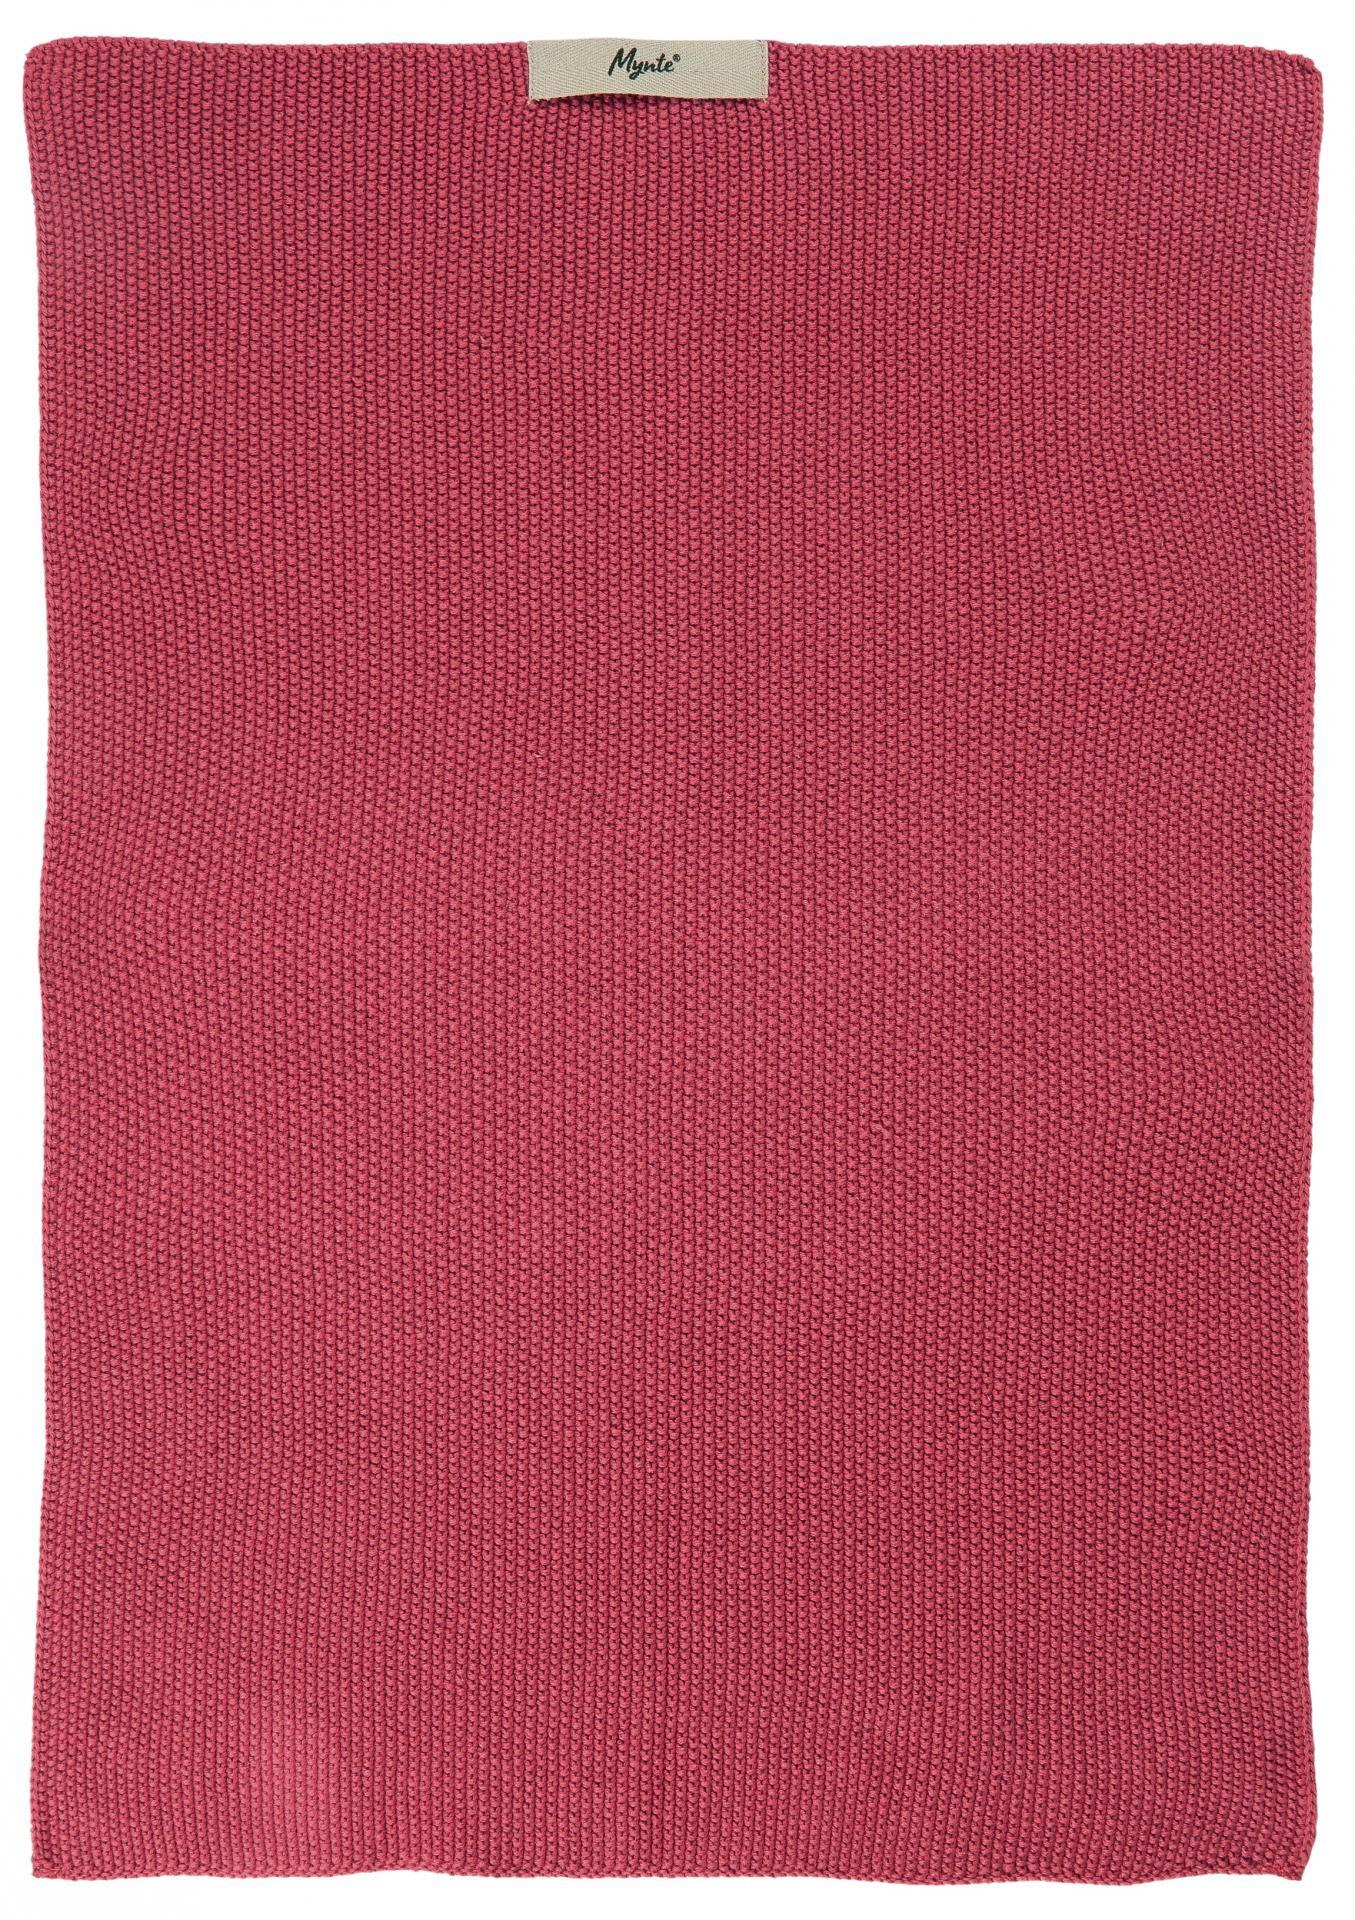 IB LAURSEN Pletená utěrka Mynte Blackberry Parfait, růžová barva, textil